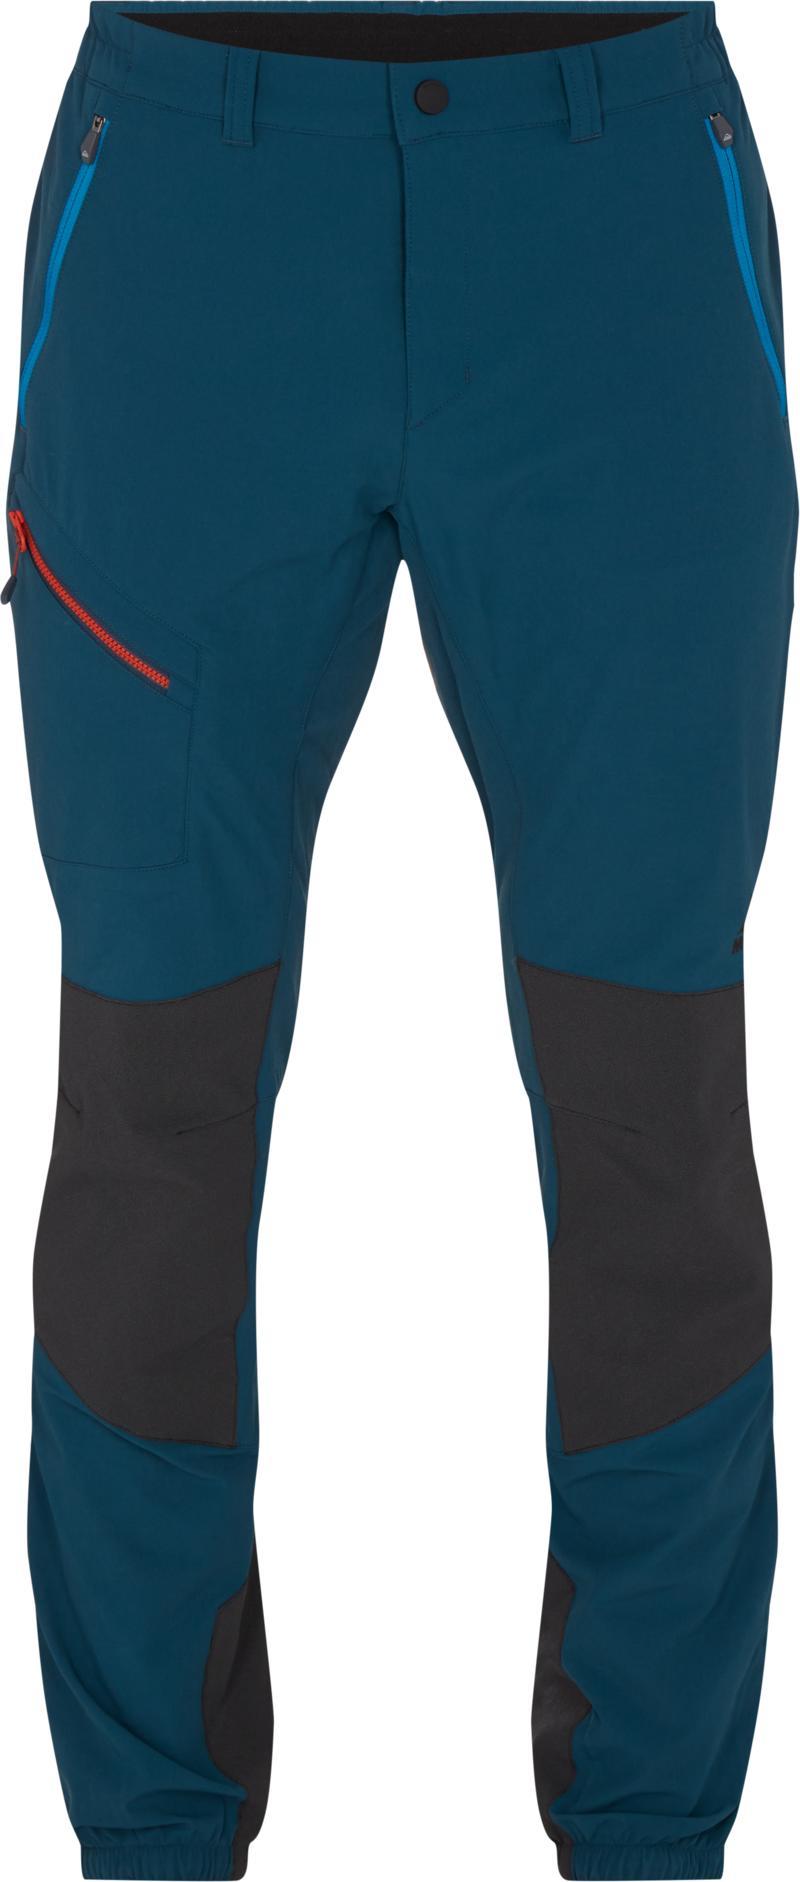 McKinley BEIRA MN, moške pohodne hlače